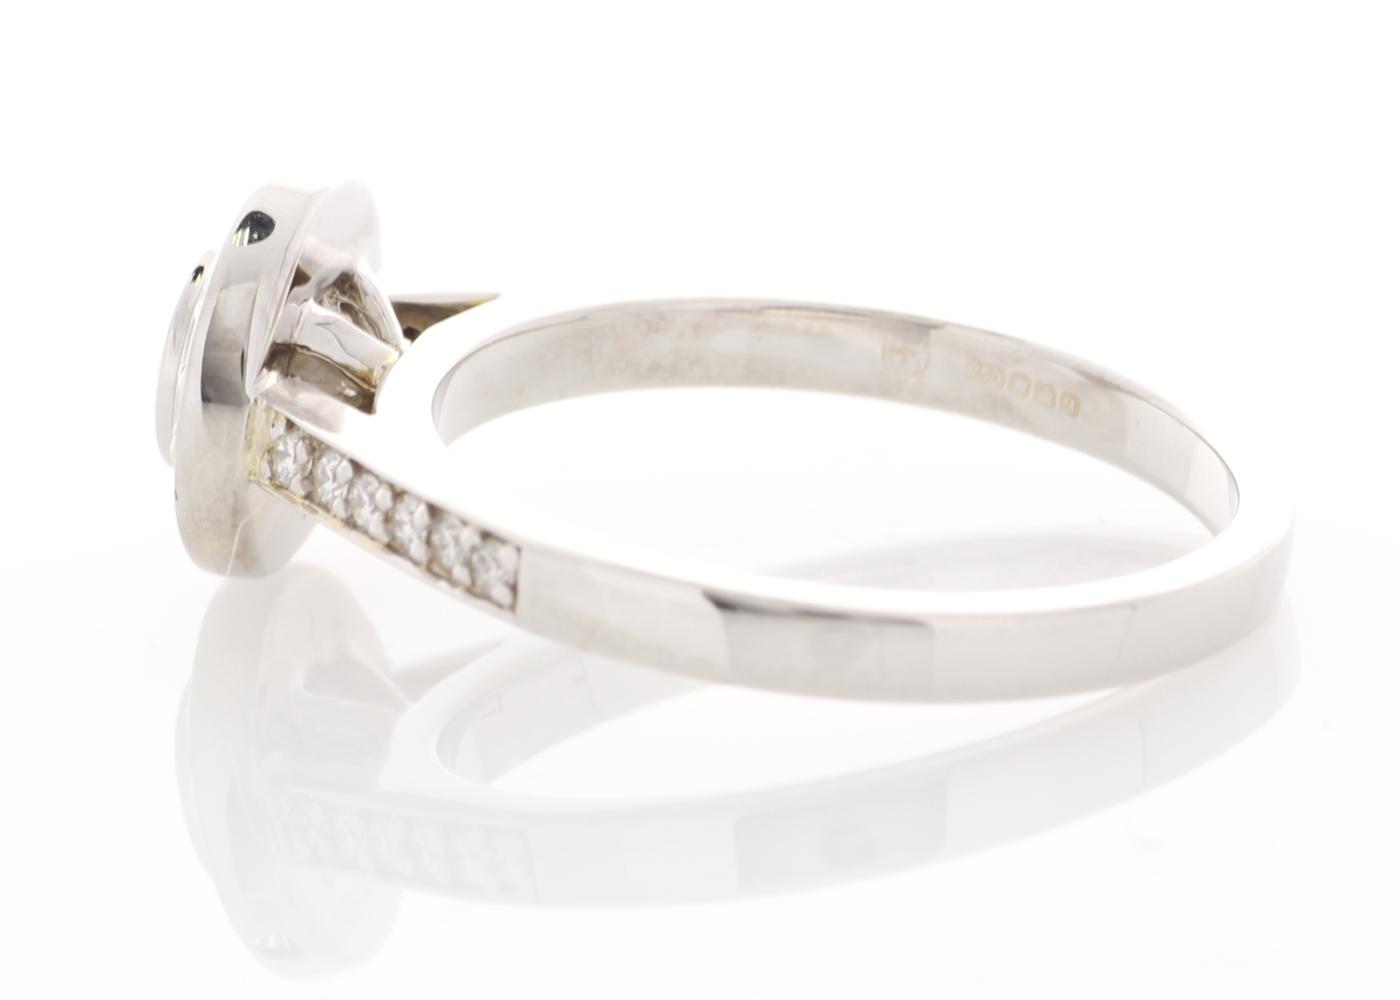 Lot 29 - 18ct White Gold Halo Set Ring 0.51 Carats